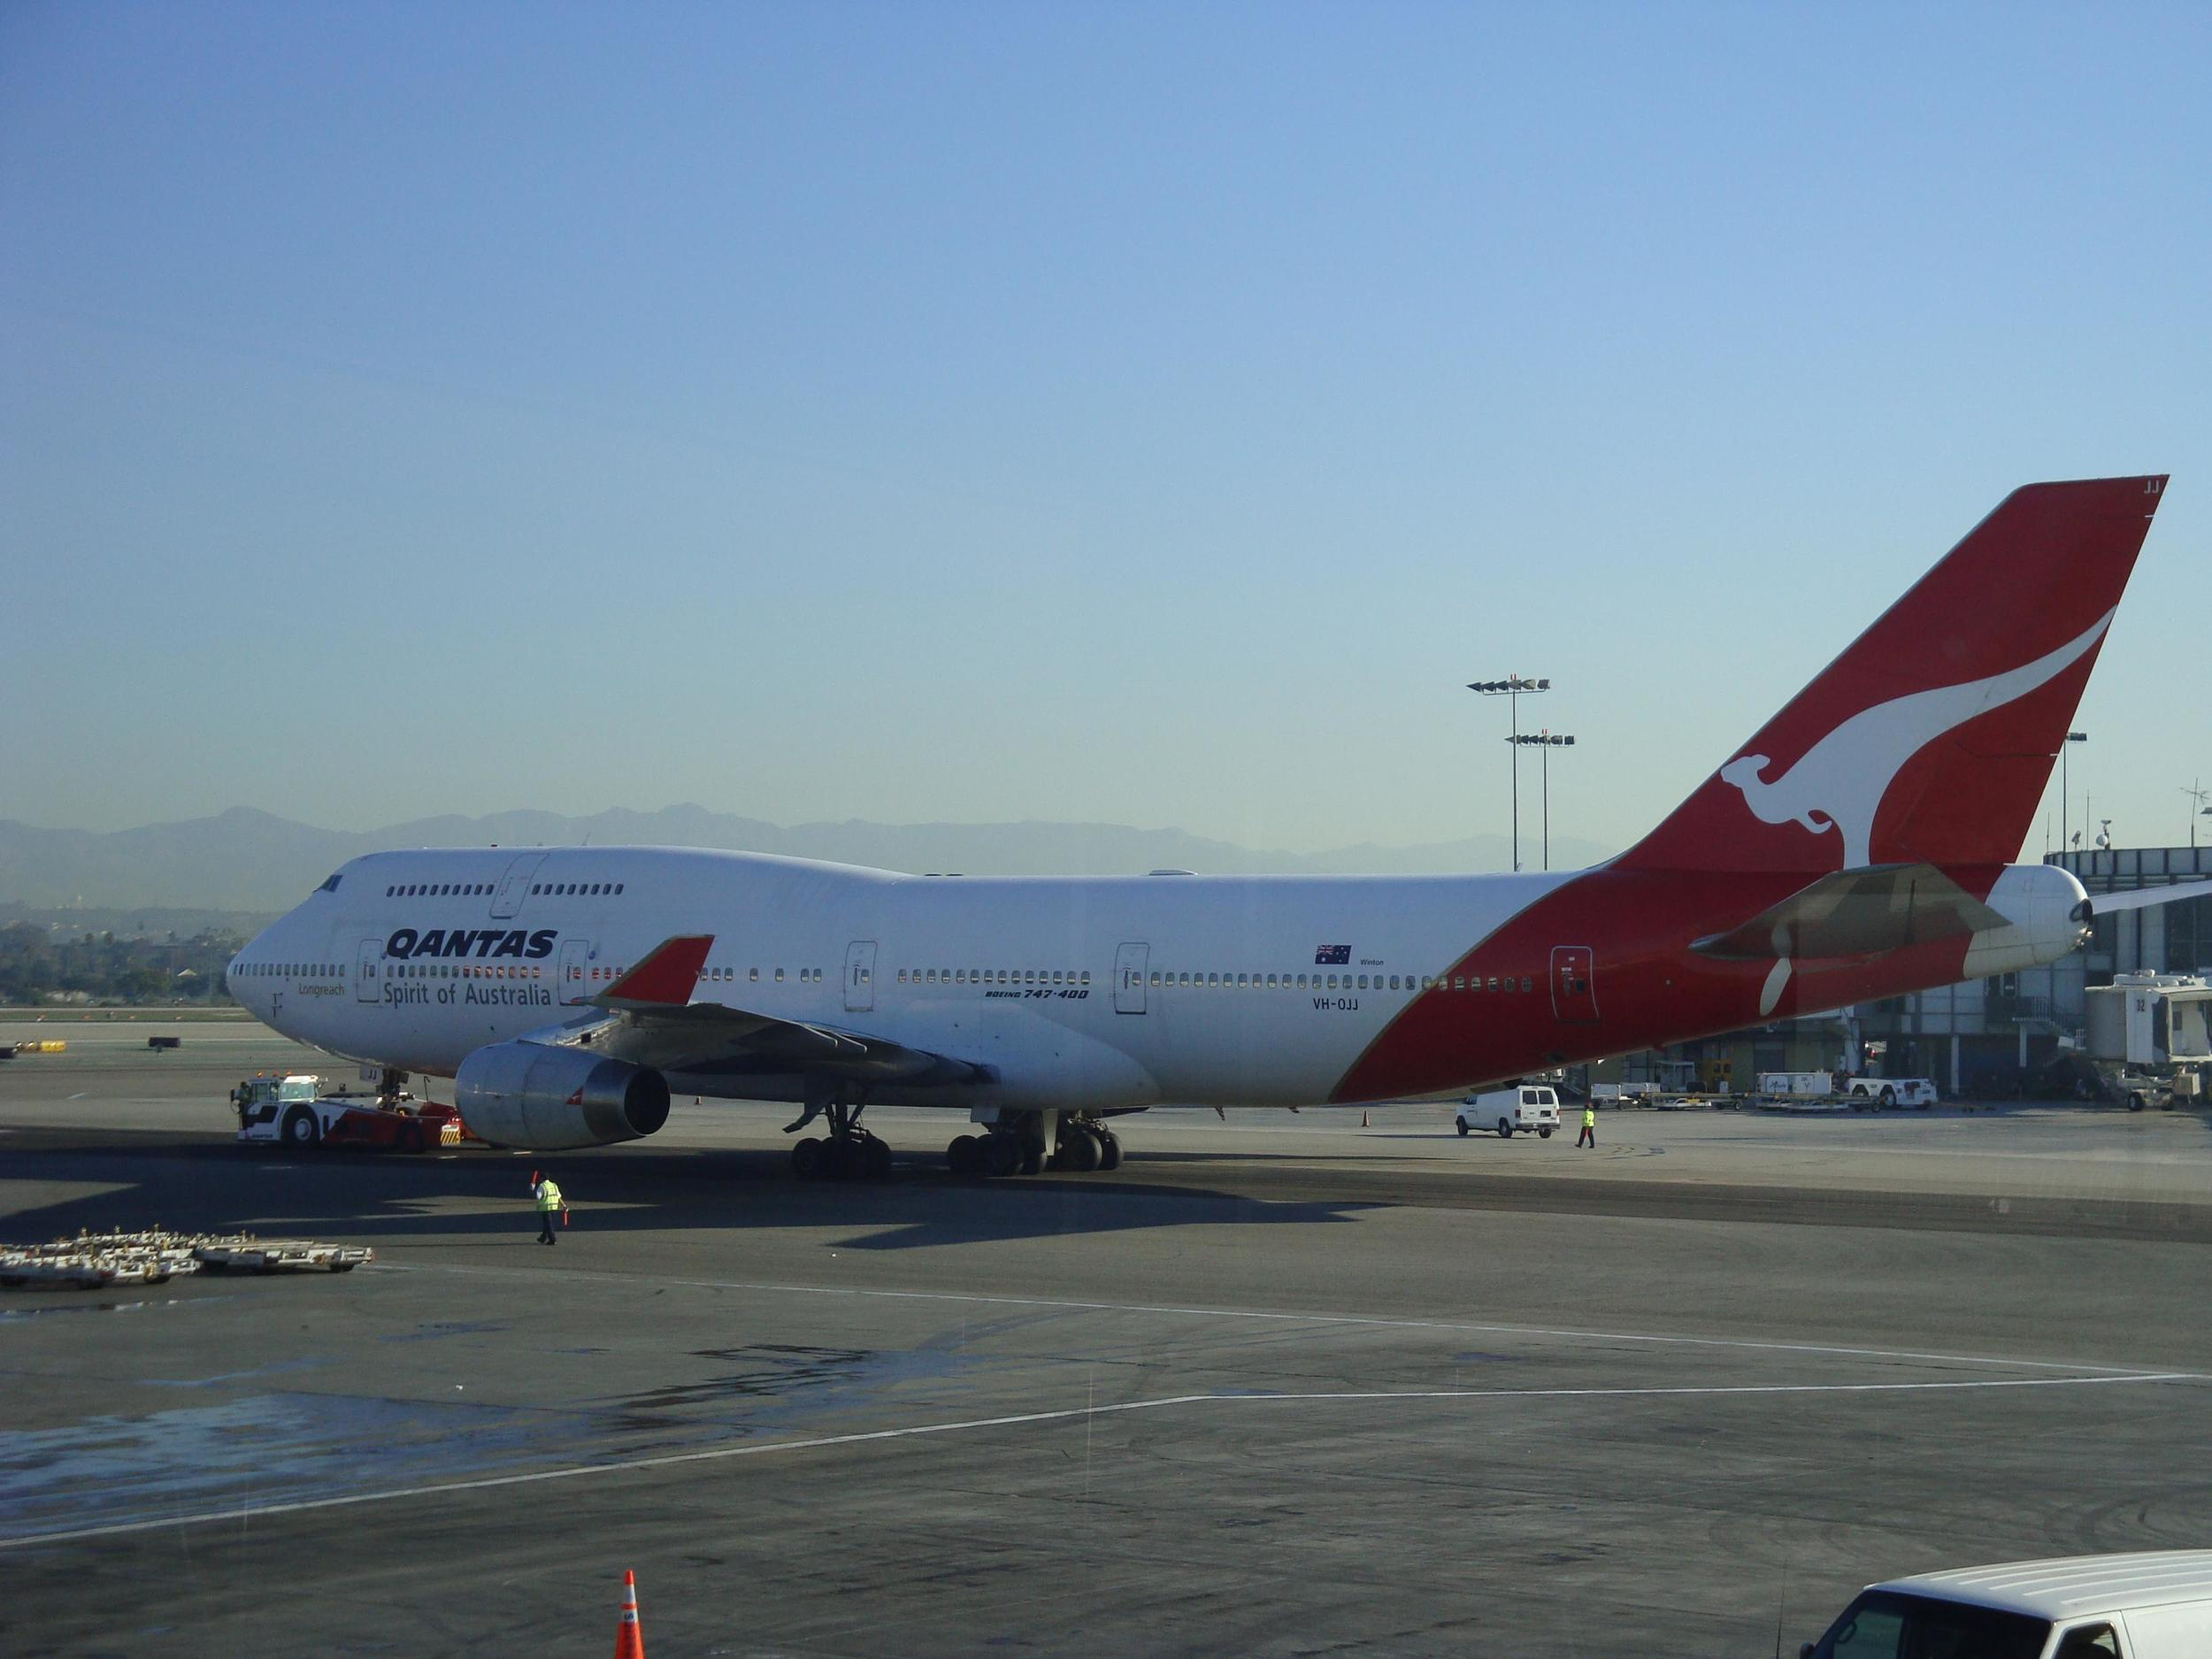 QANTAS 747 LEAVING SYDNEY